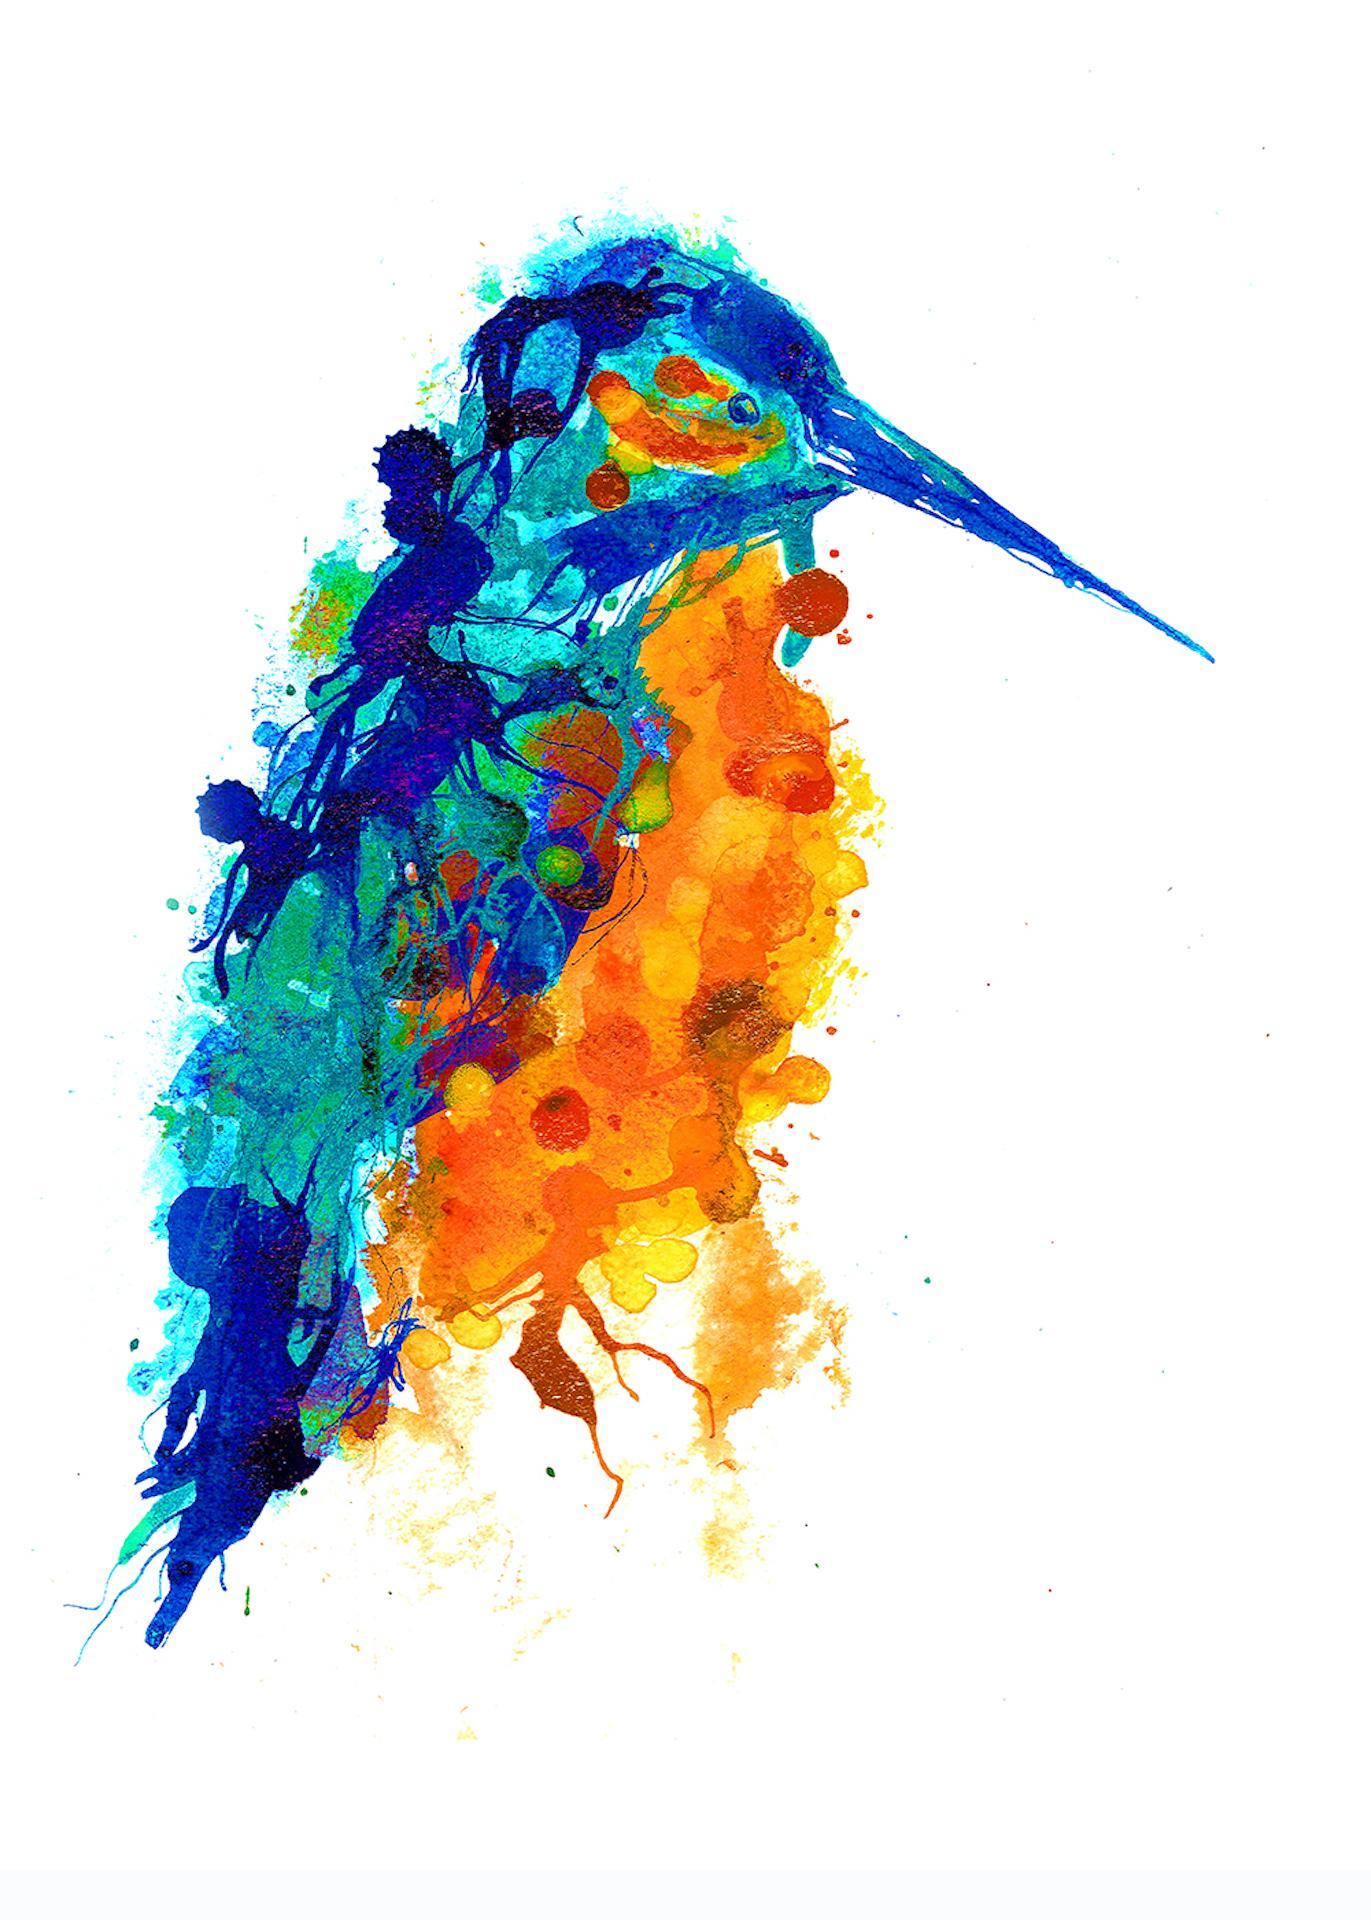 Gavin Dobson, Kingfisher, Limited Edition Print, Animal Art, Affordable Art